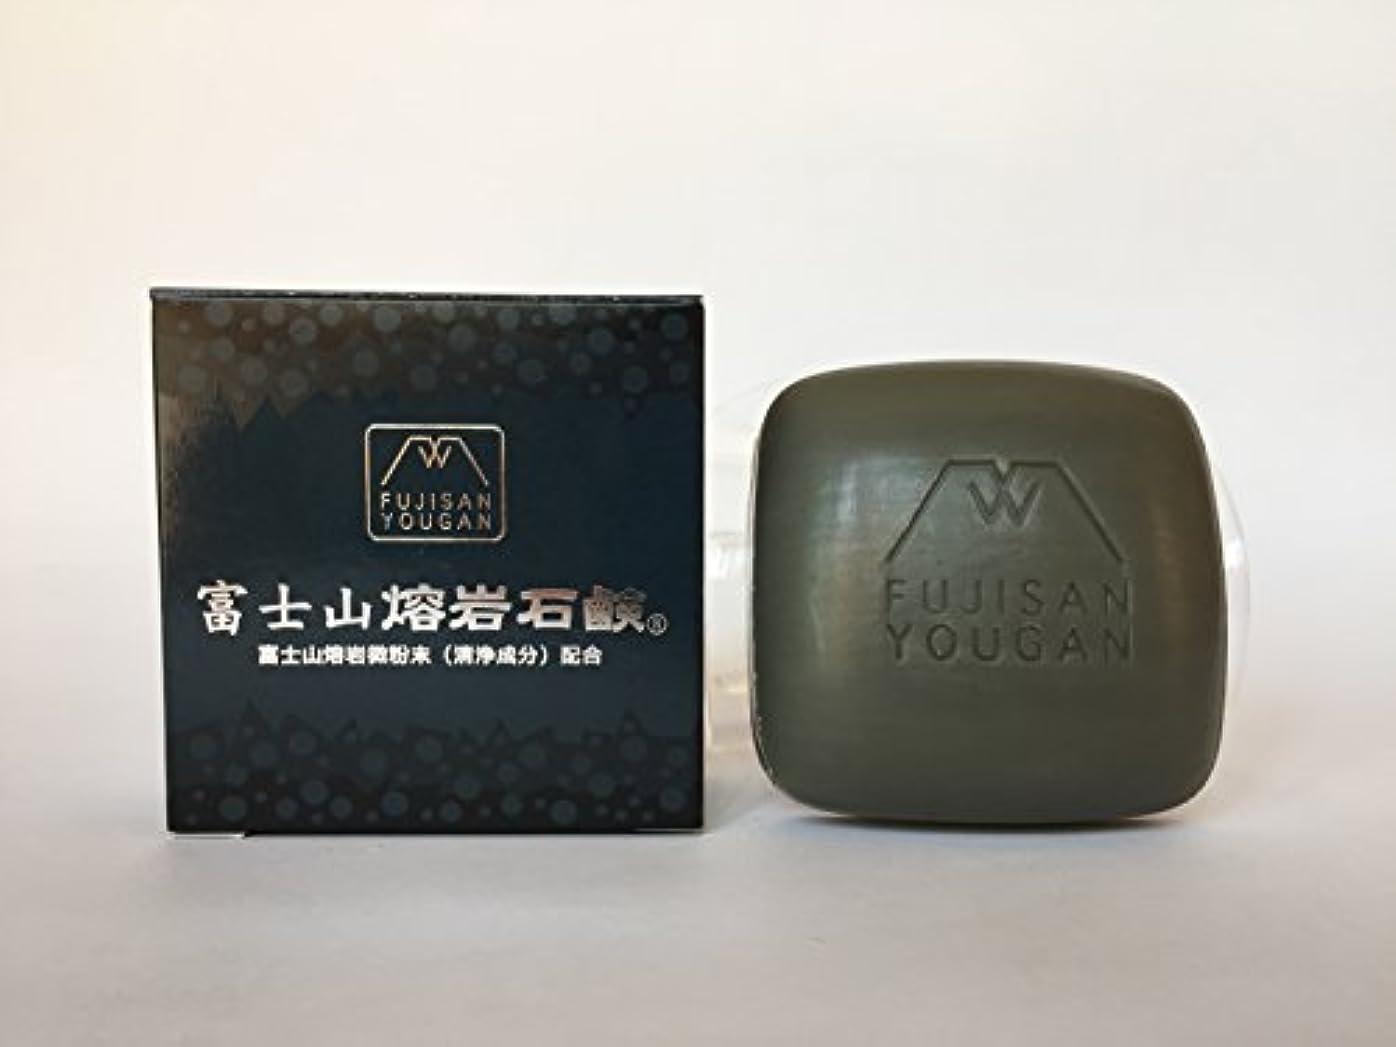 標準同僚飛ぶ富士山溶岩石鹸 100g/個×2個セット